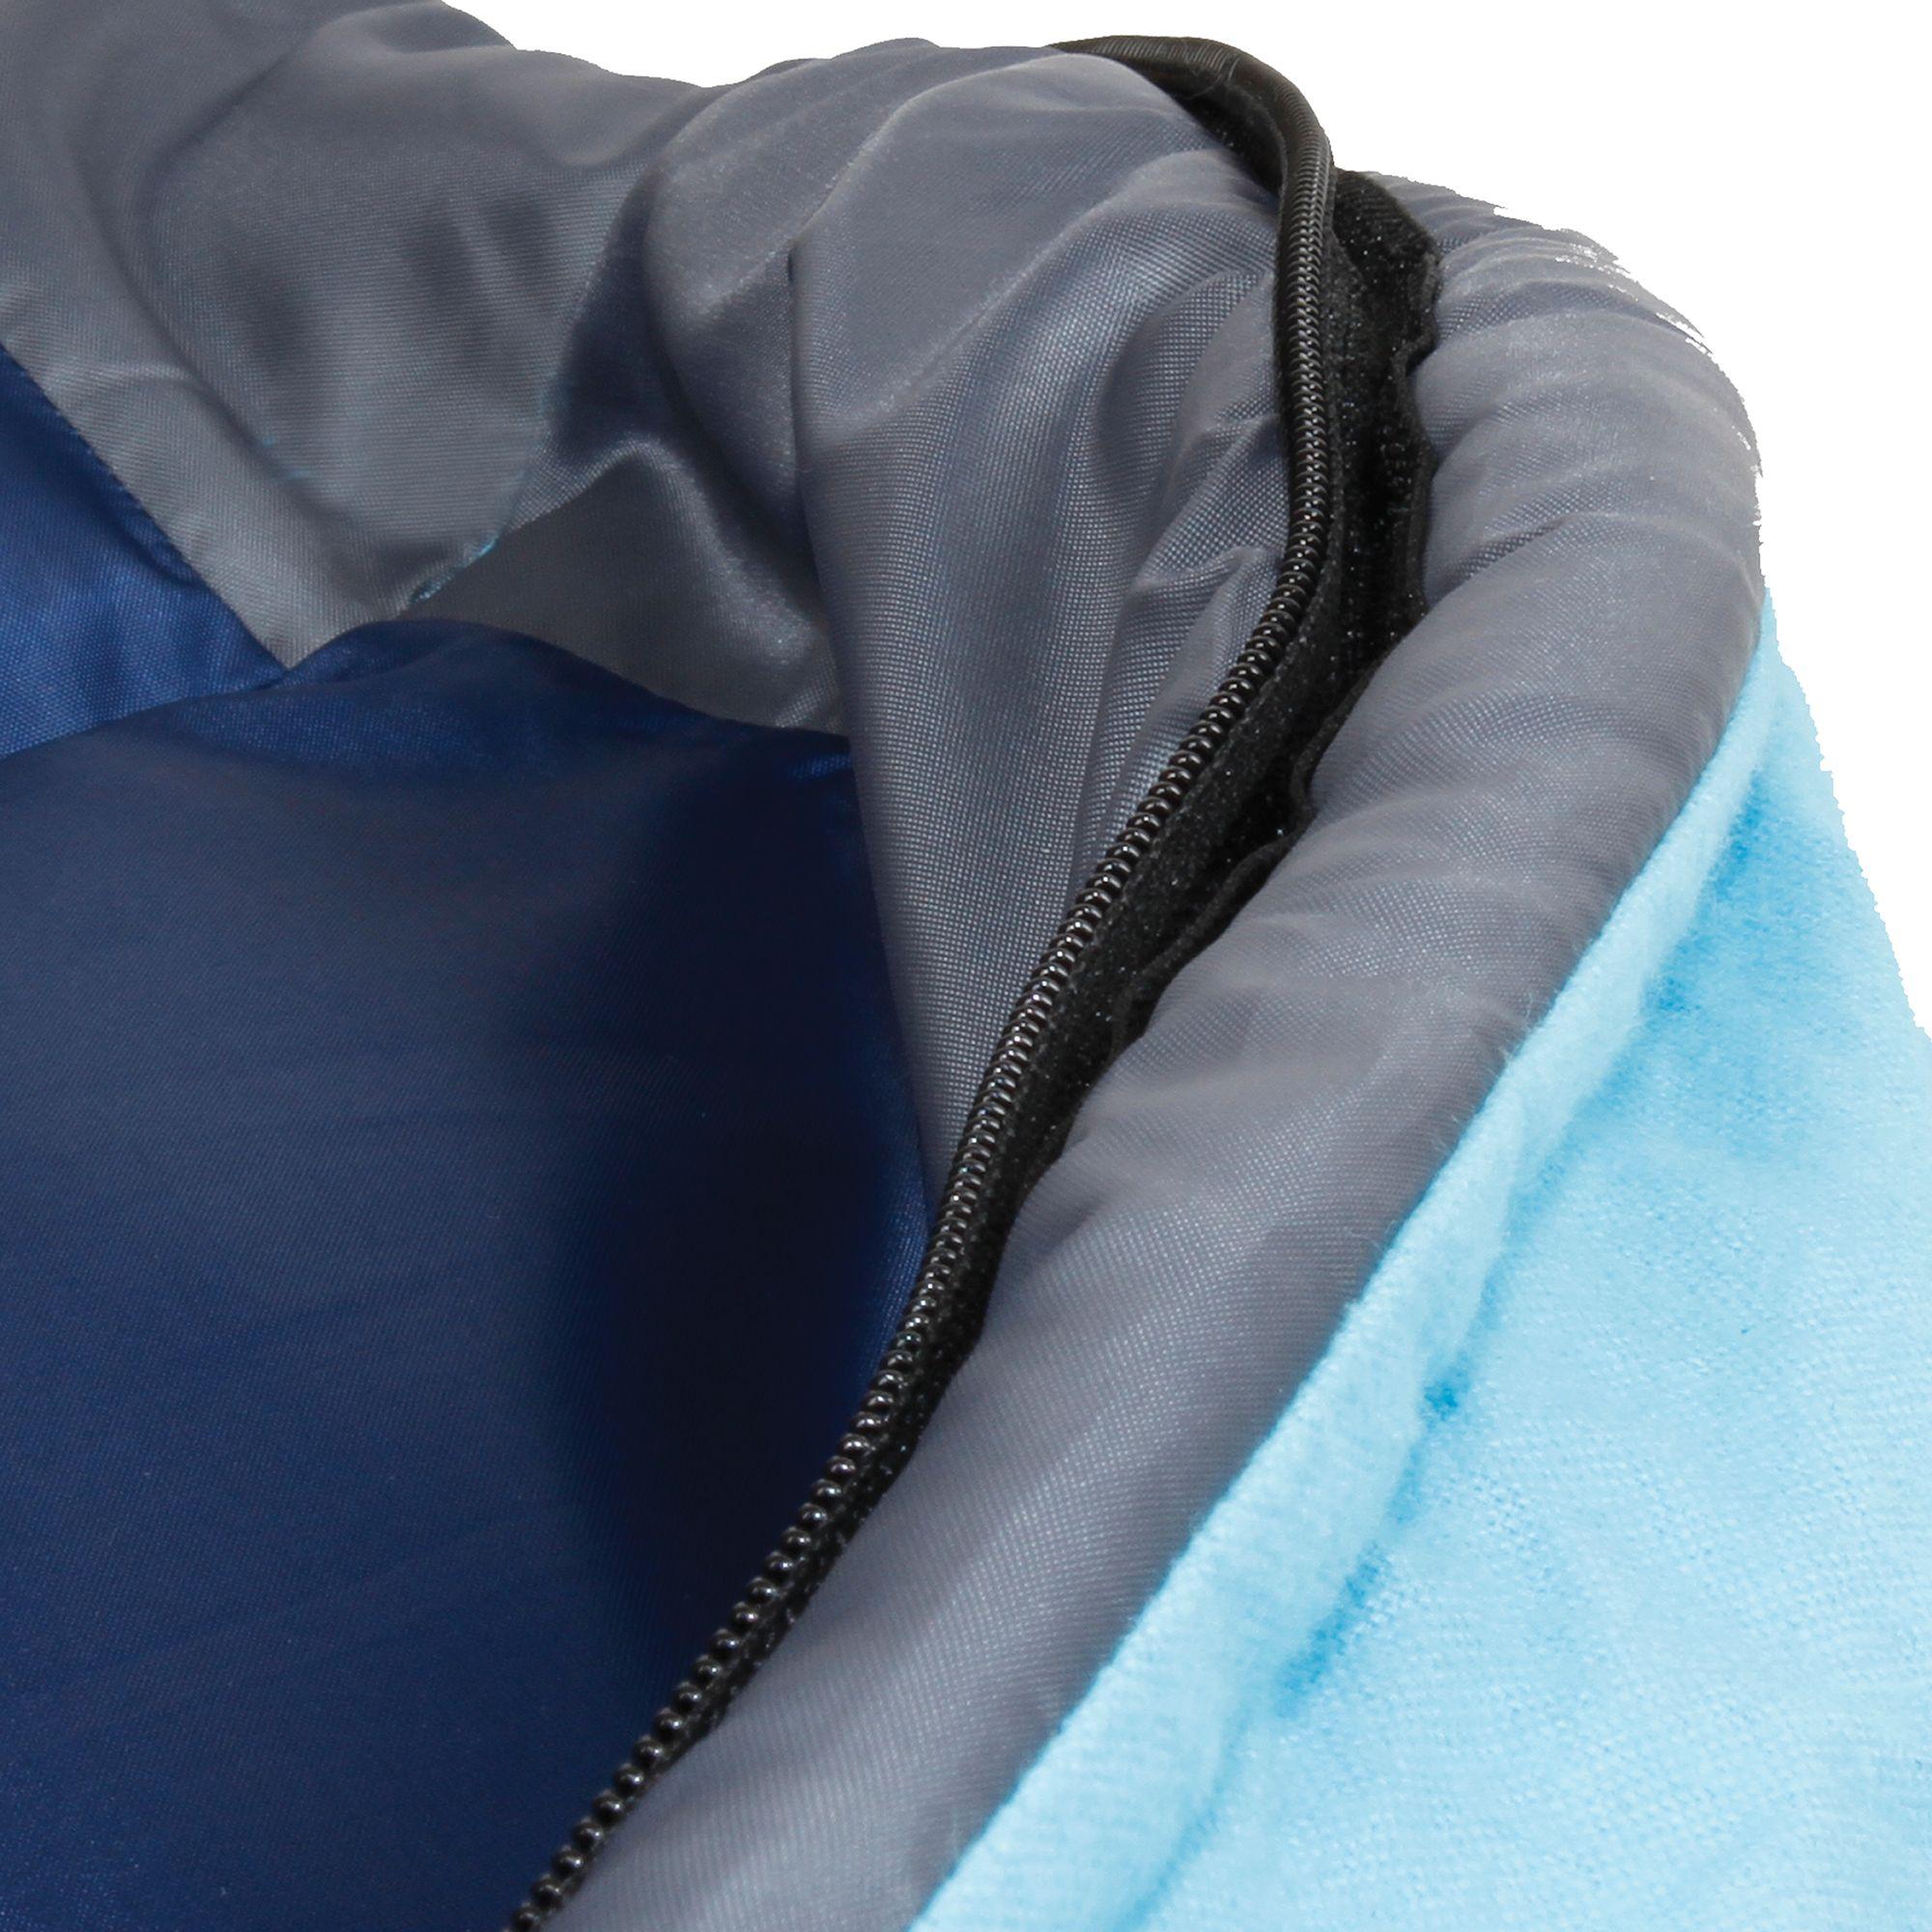 site p comforter best nest pump e thermostat comfort white buy heat aqua